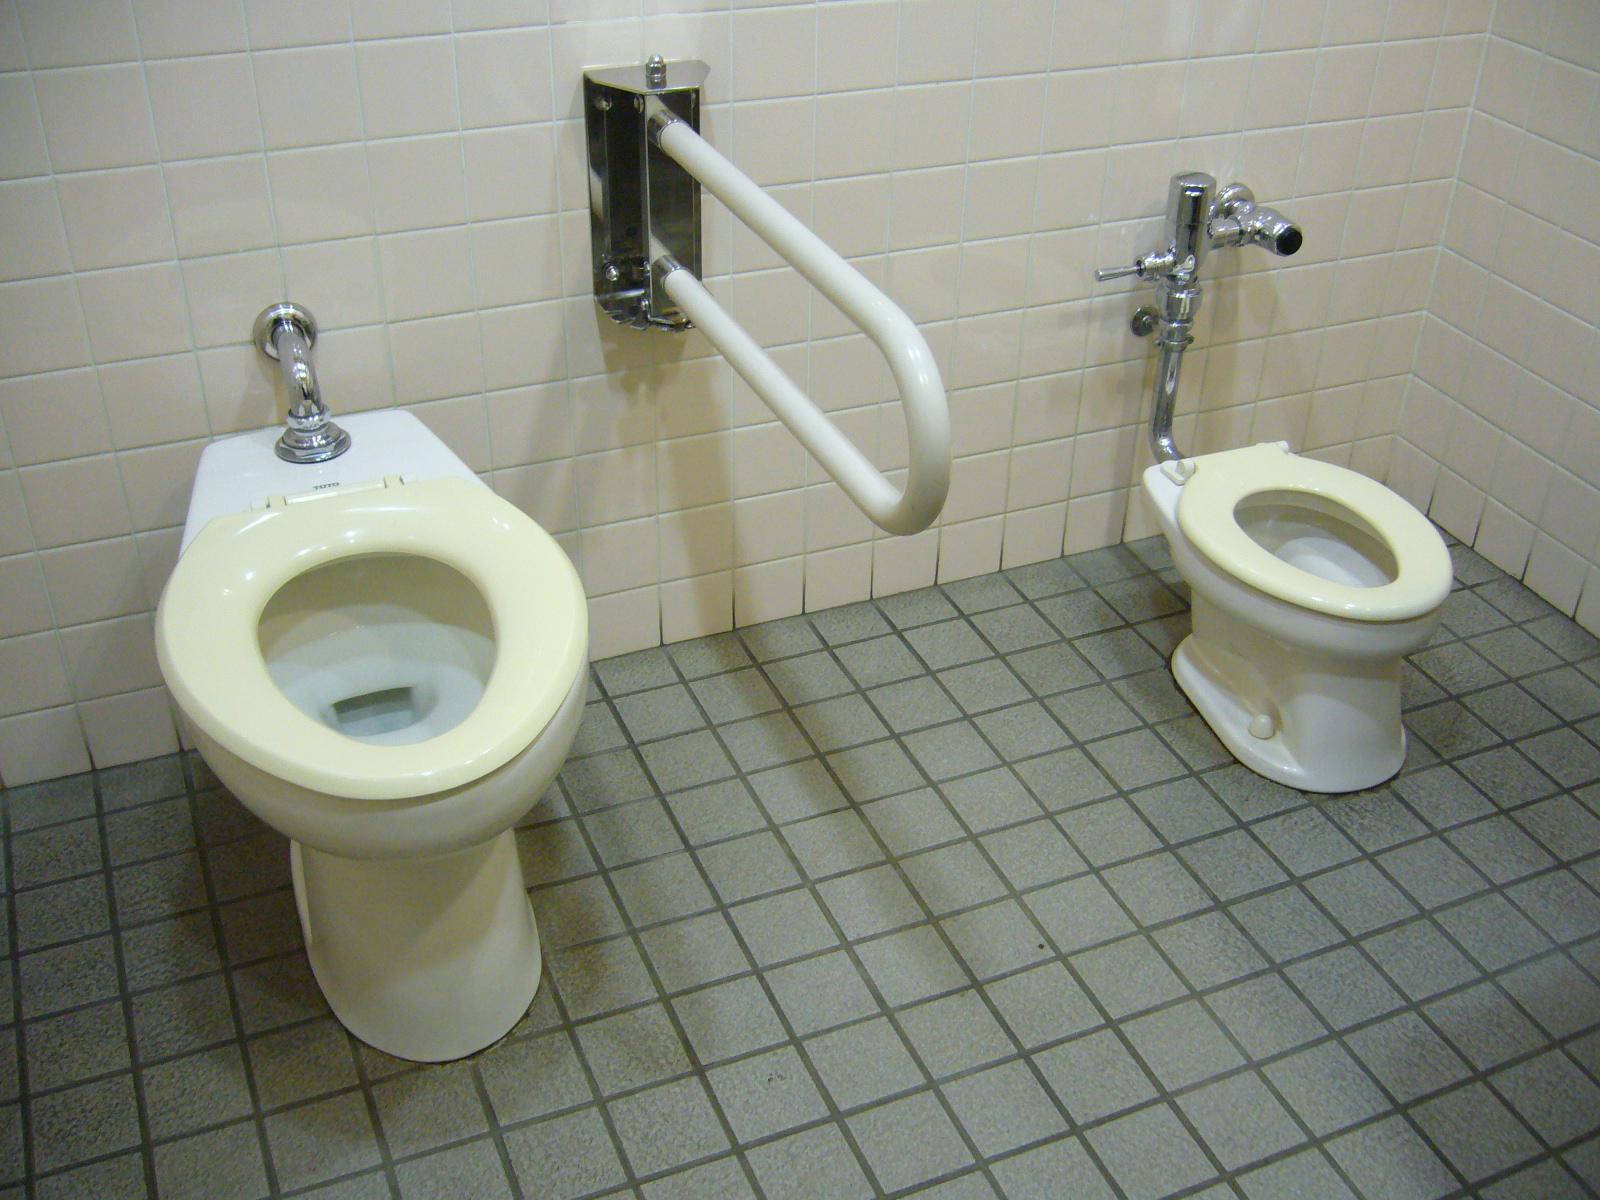 file toilet ordinary child child benki japan jpg